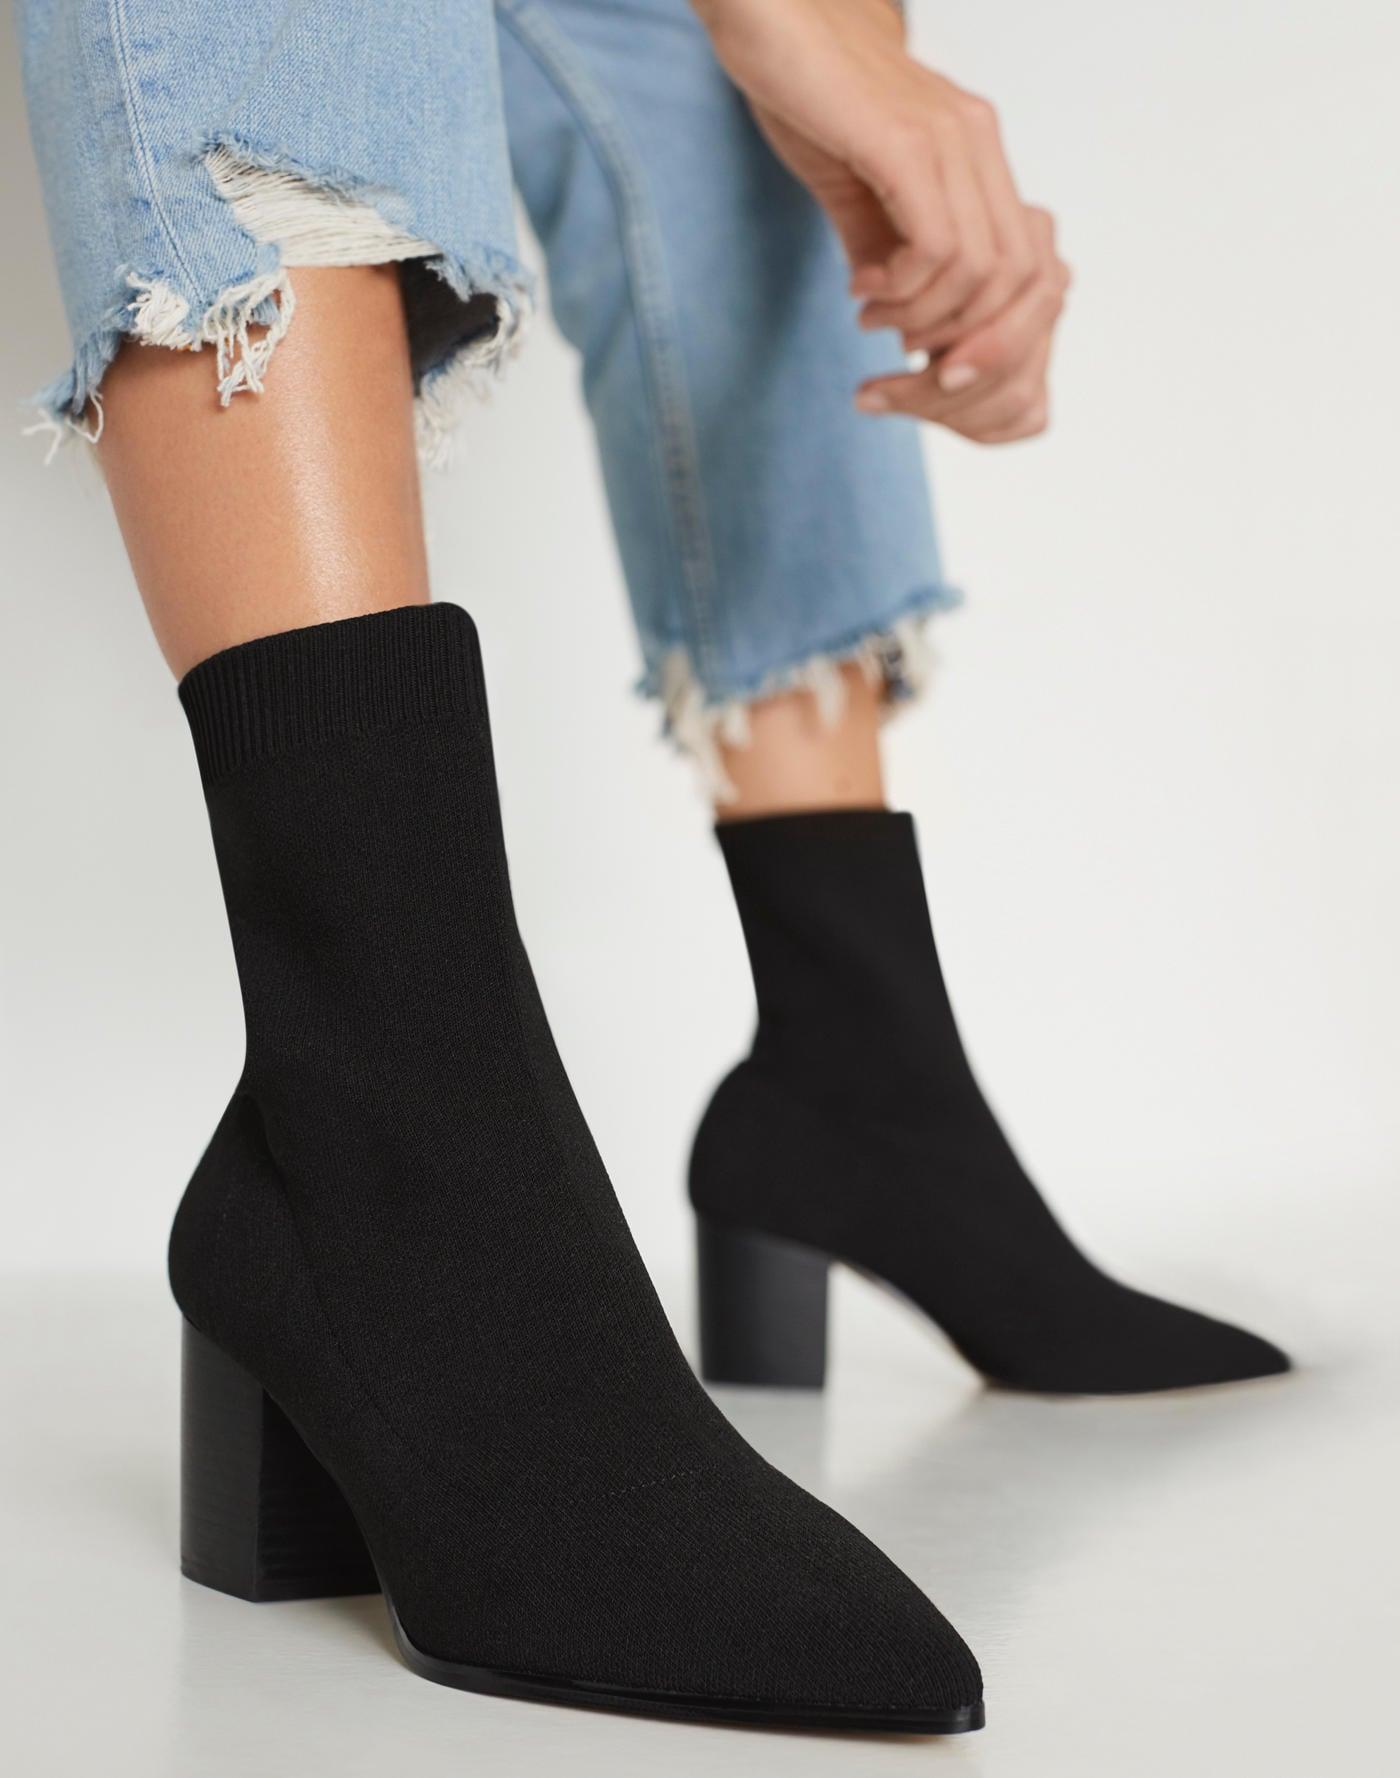 aca299a5b Women's Boots | Casual & Formal | ALDO Canada | ALDO Canada